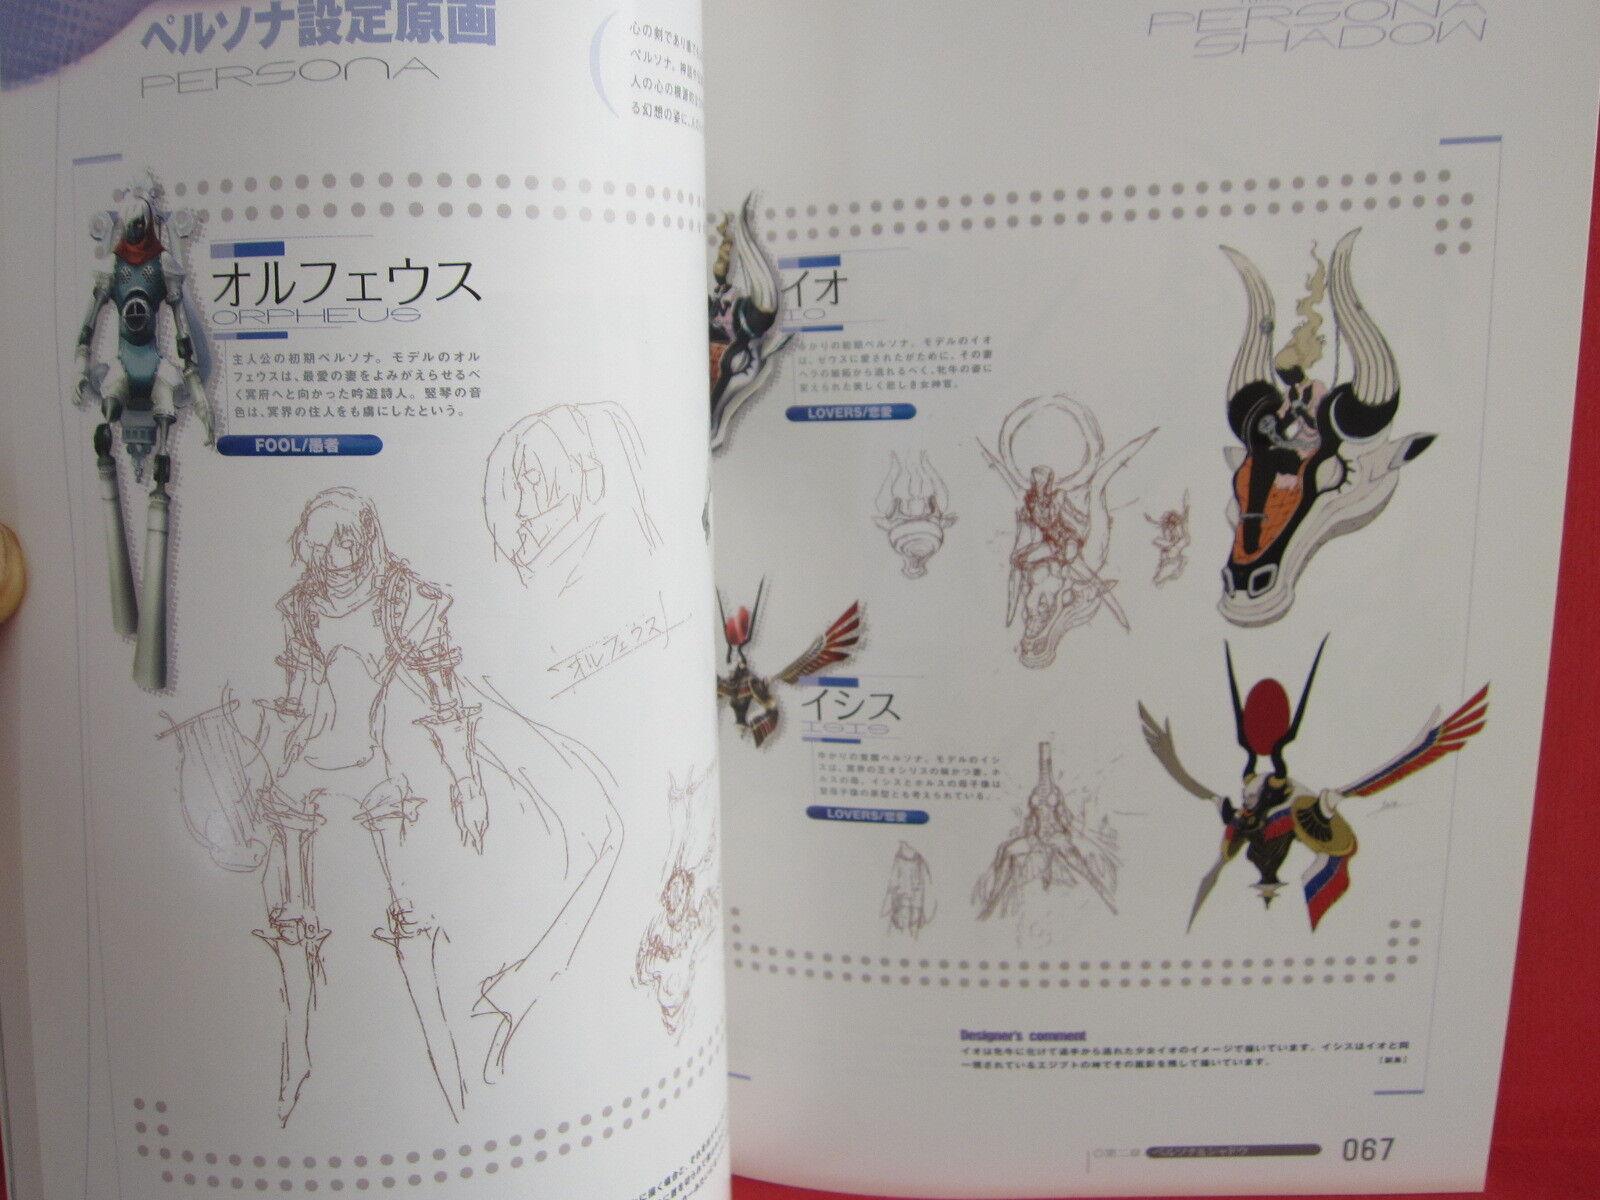 Persona 3 Official Design Works Ps2 Japan Original Edition Game Art Book